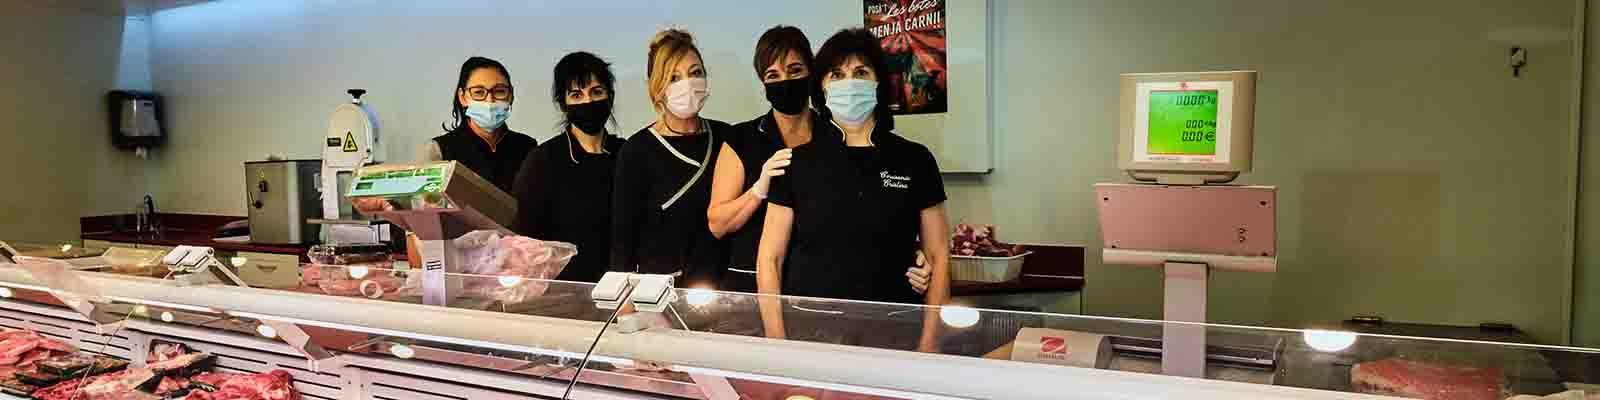 Carnicería Cristina